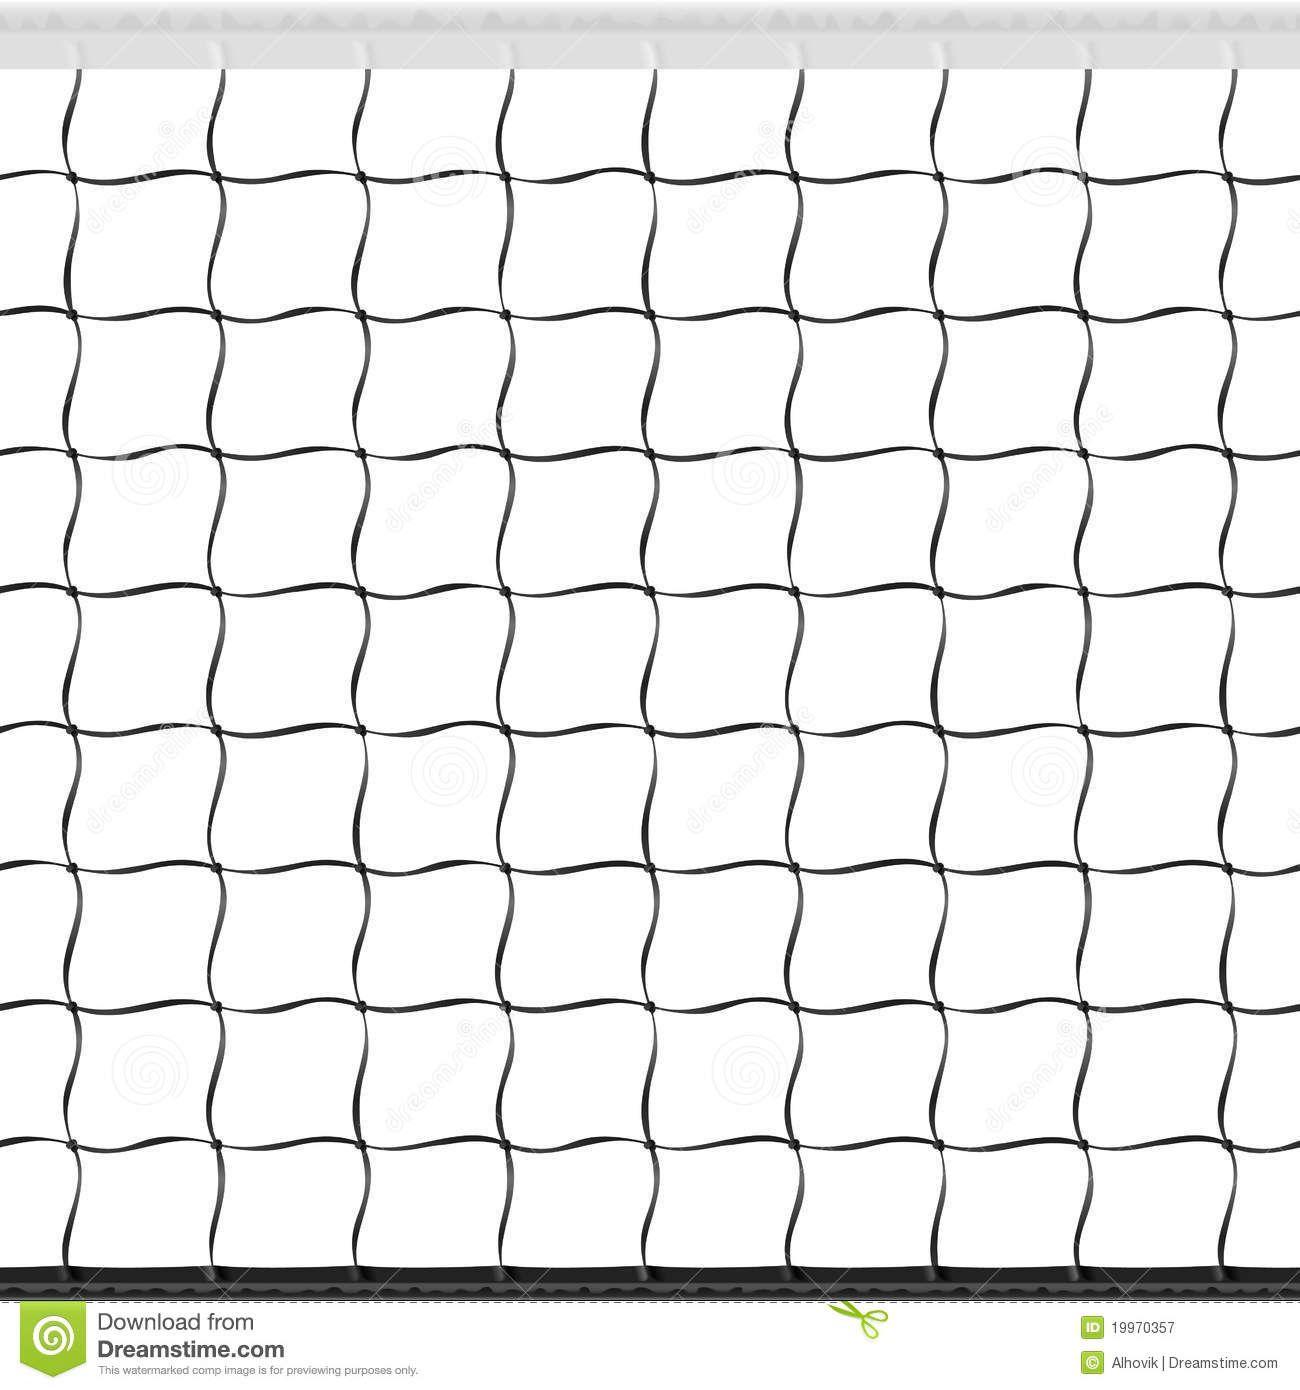 volleyball net pattern.